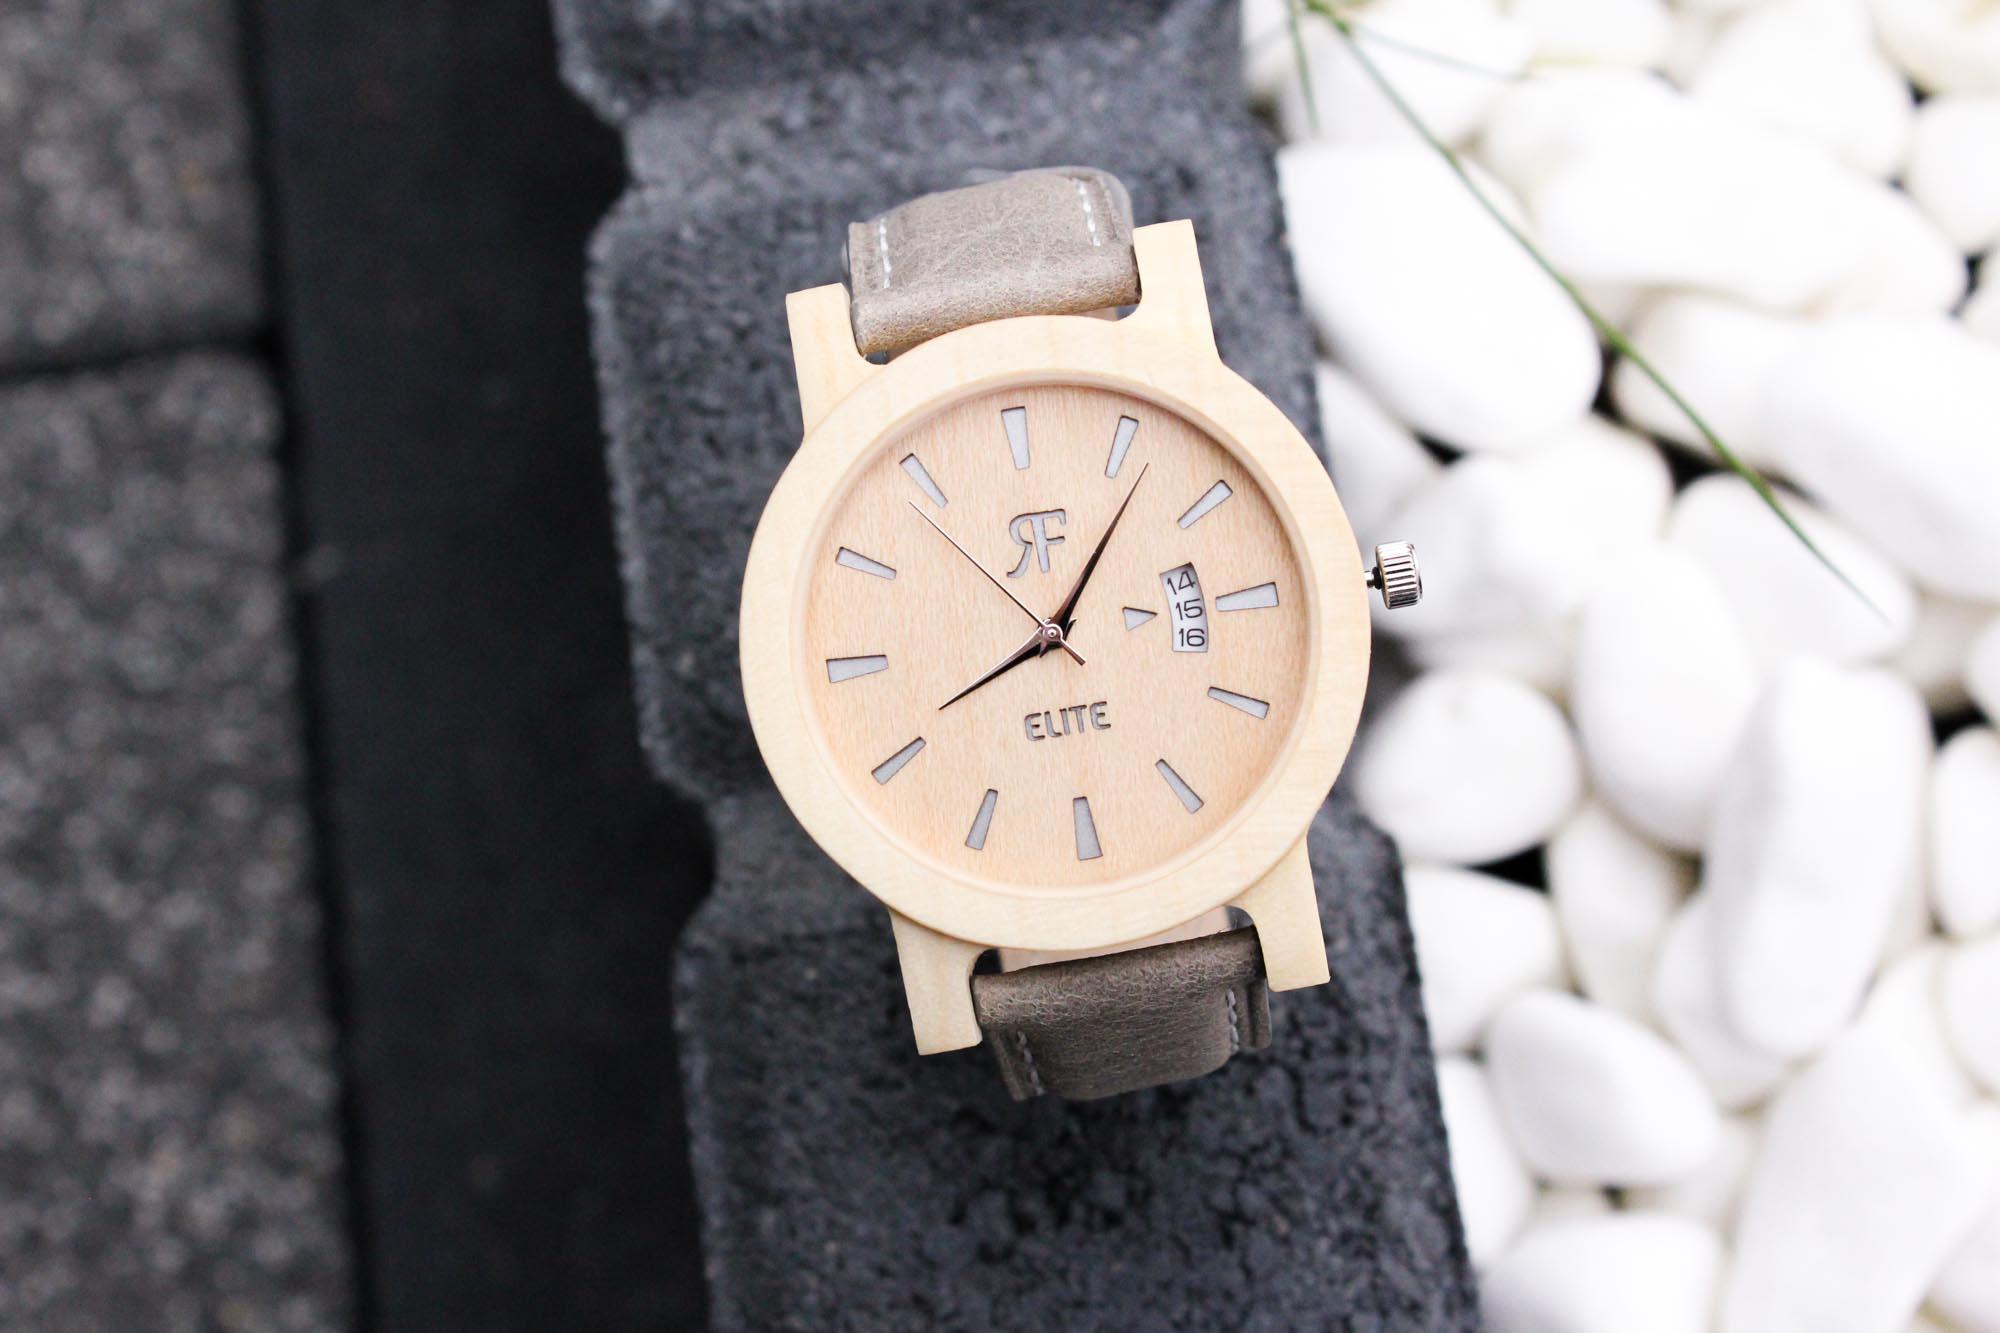 Zegarek drewniany Realforest Elite Srebrny Klon